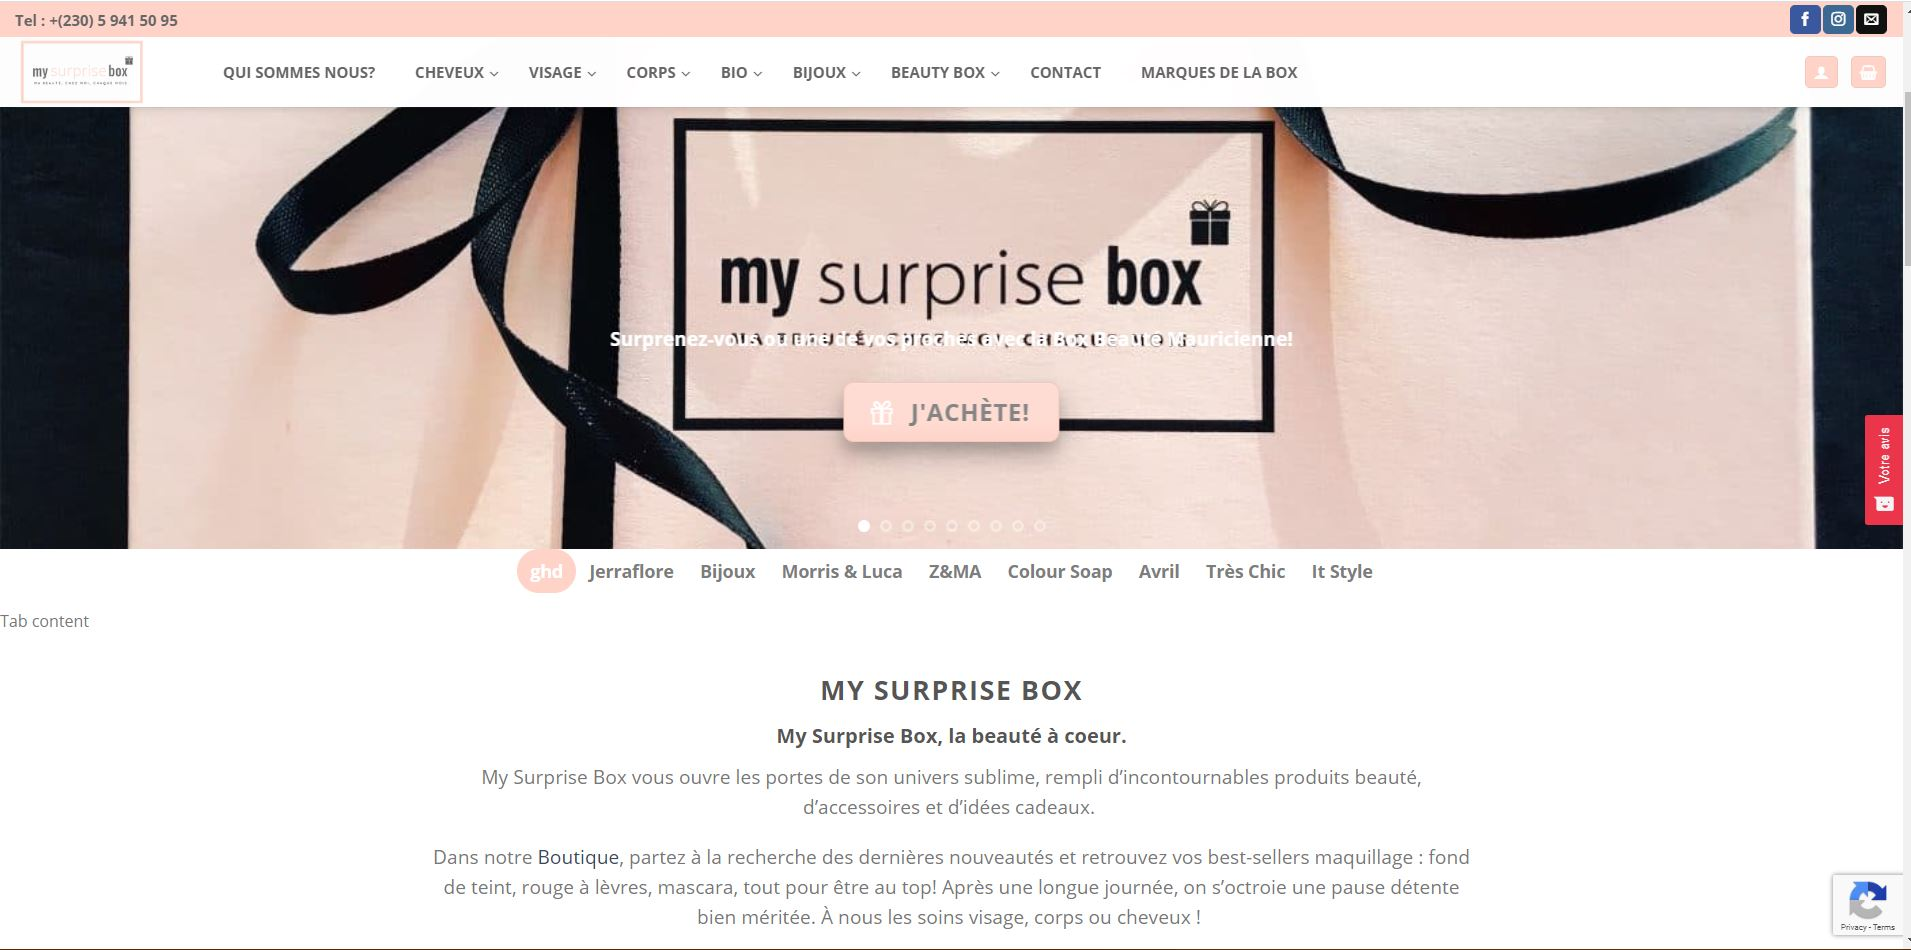 MySurpriseBox-Digital-Marketing-Mauritius-Ecommerce